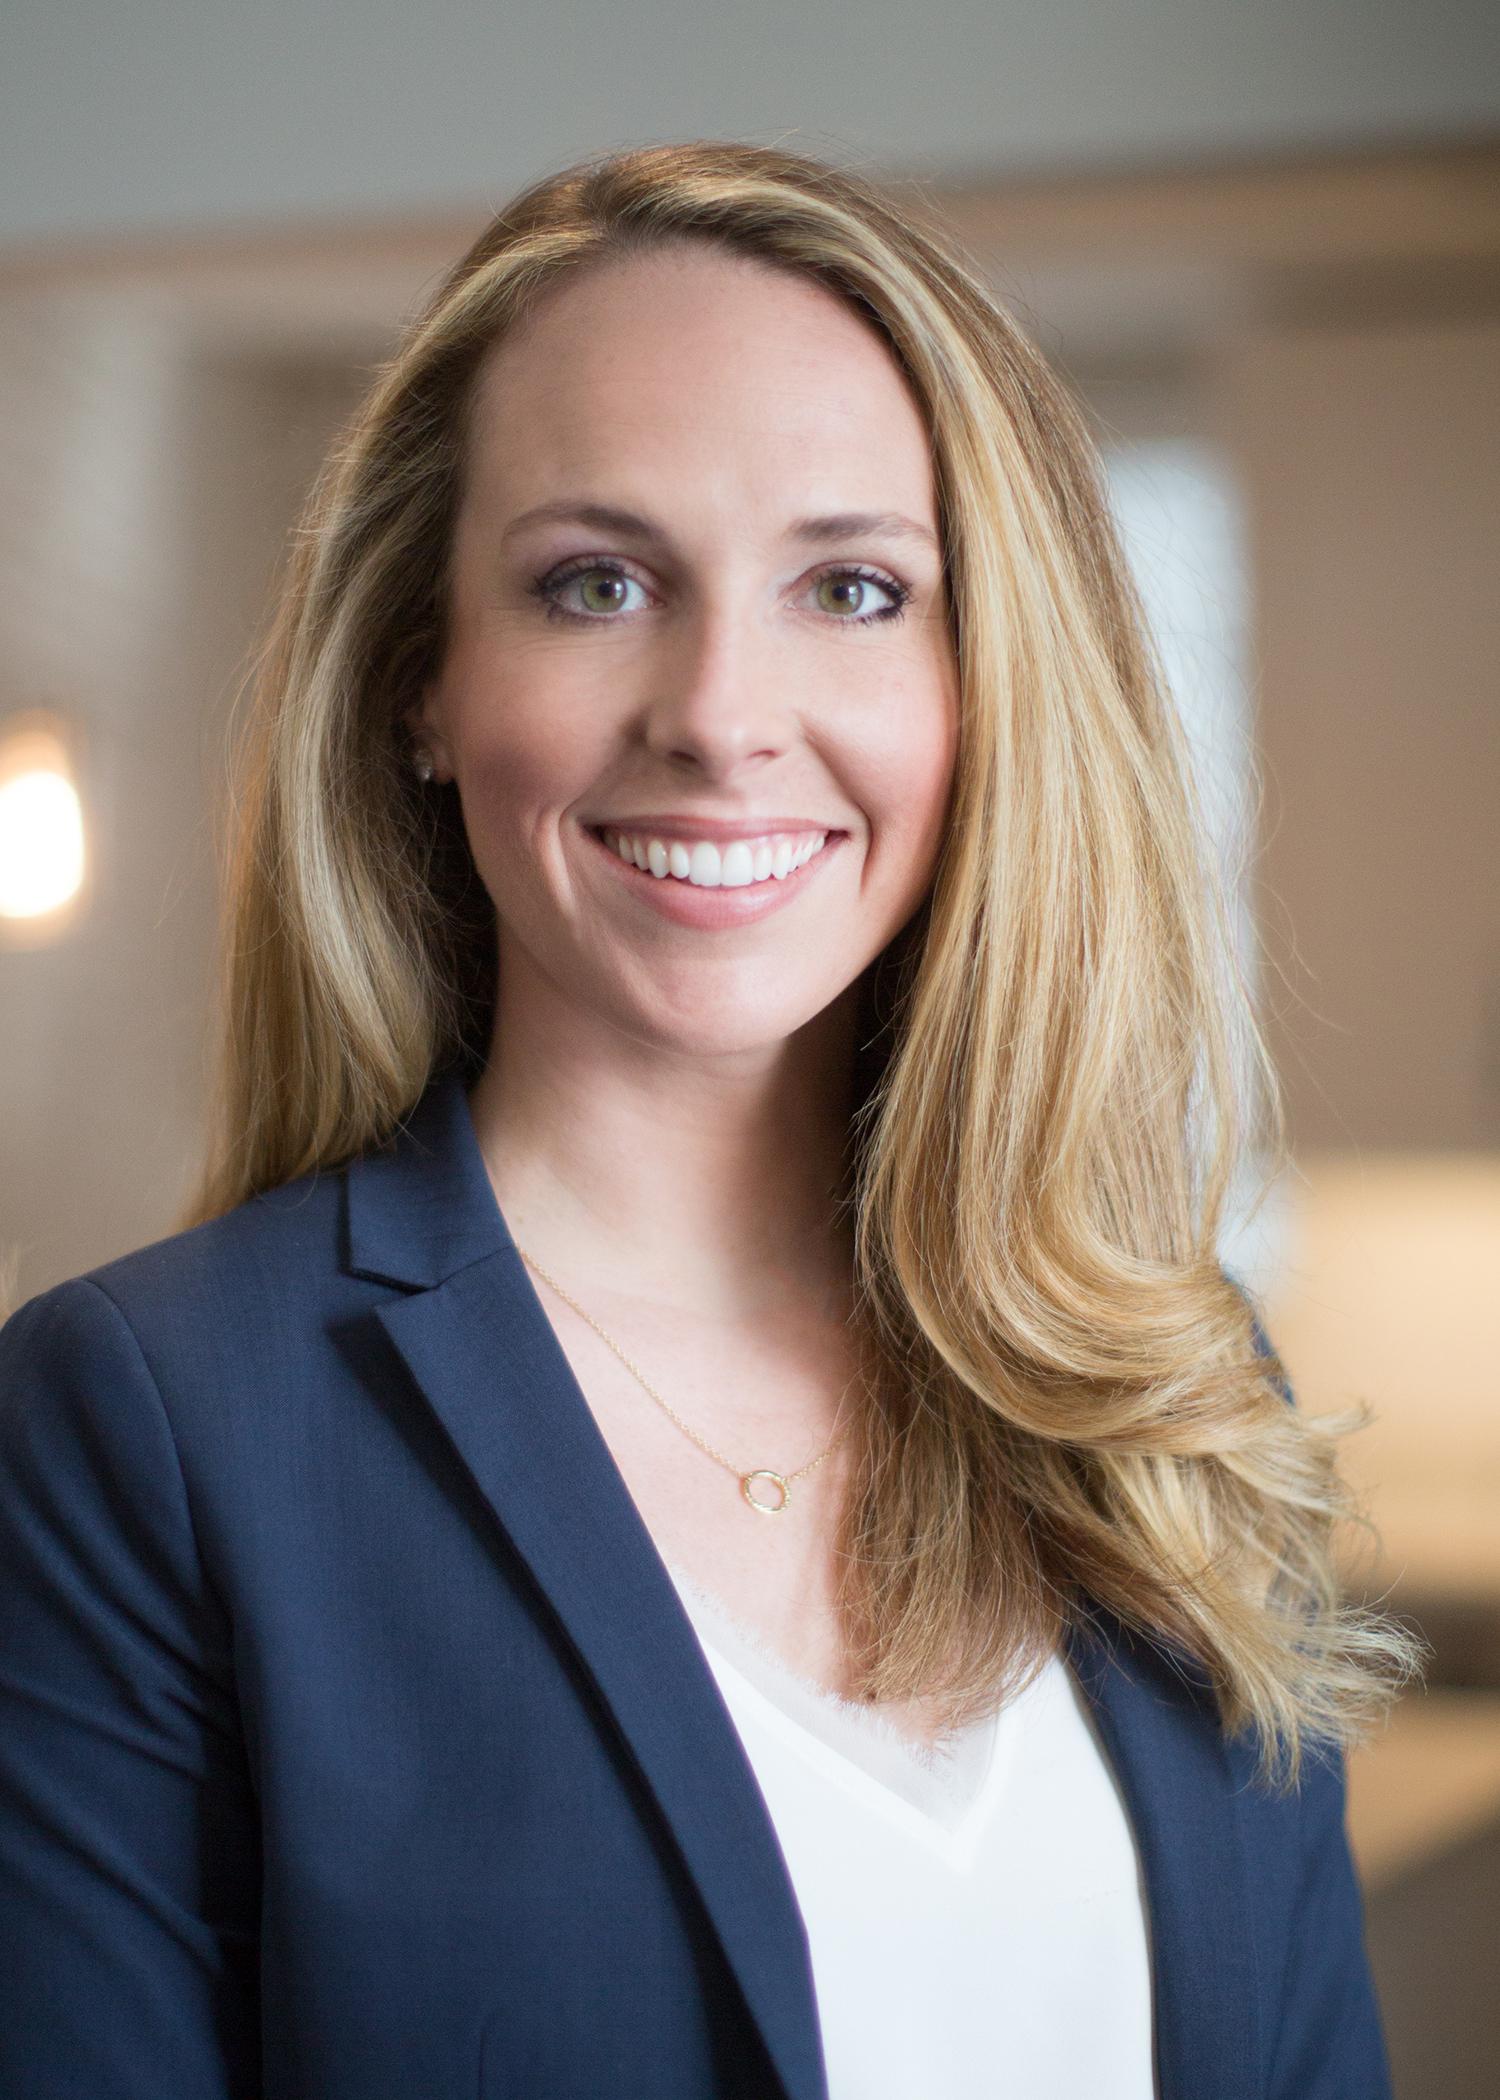 Greta Morris, Associate at Tassone, Dreicer, & Hill